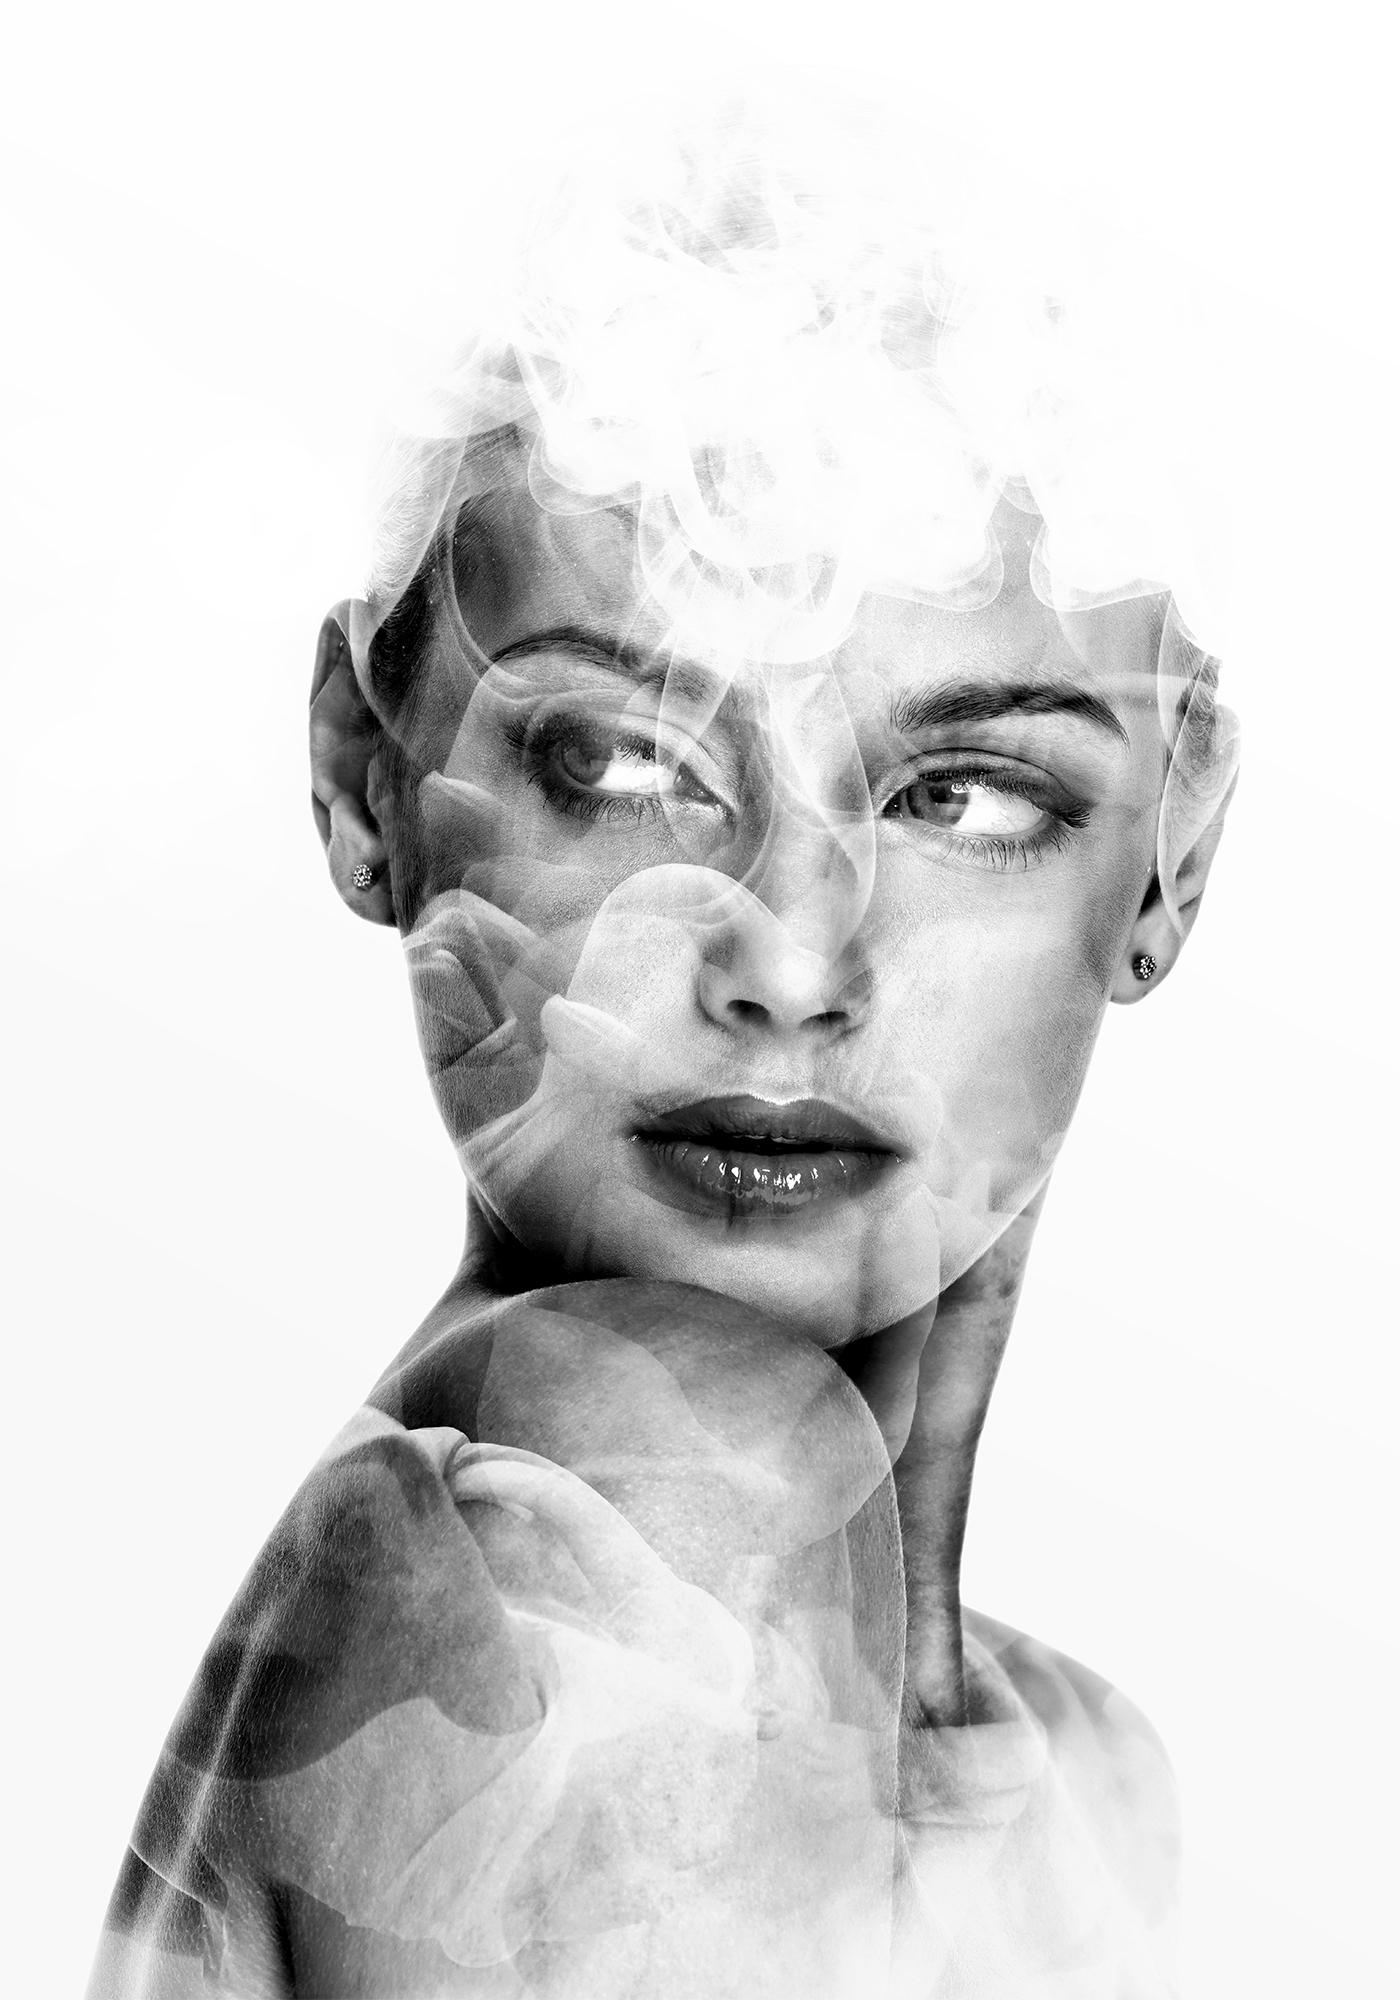 portrait woman beauty black/white colors Nature double exposure multiple exposure Emi Haze emi haze art